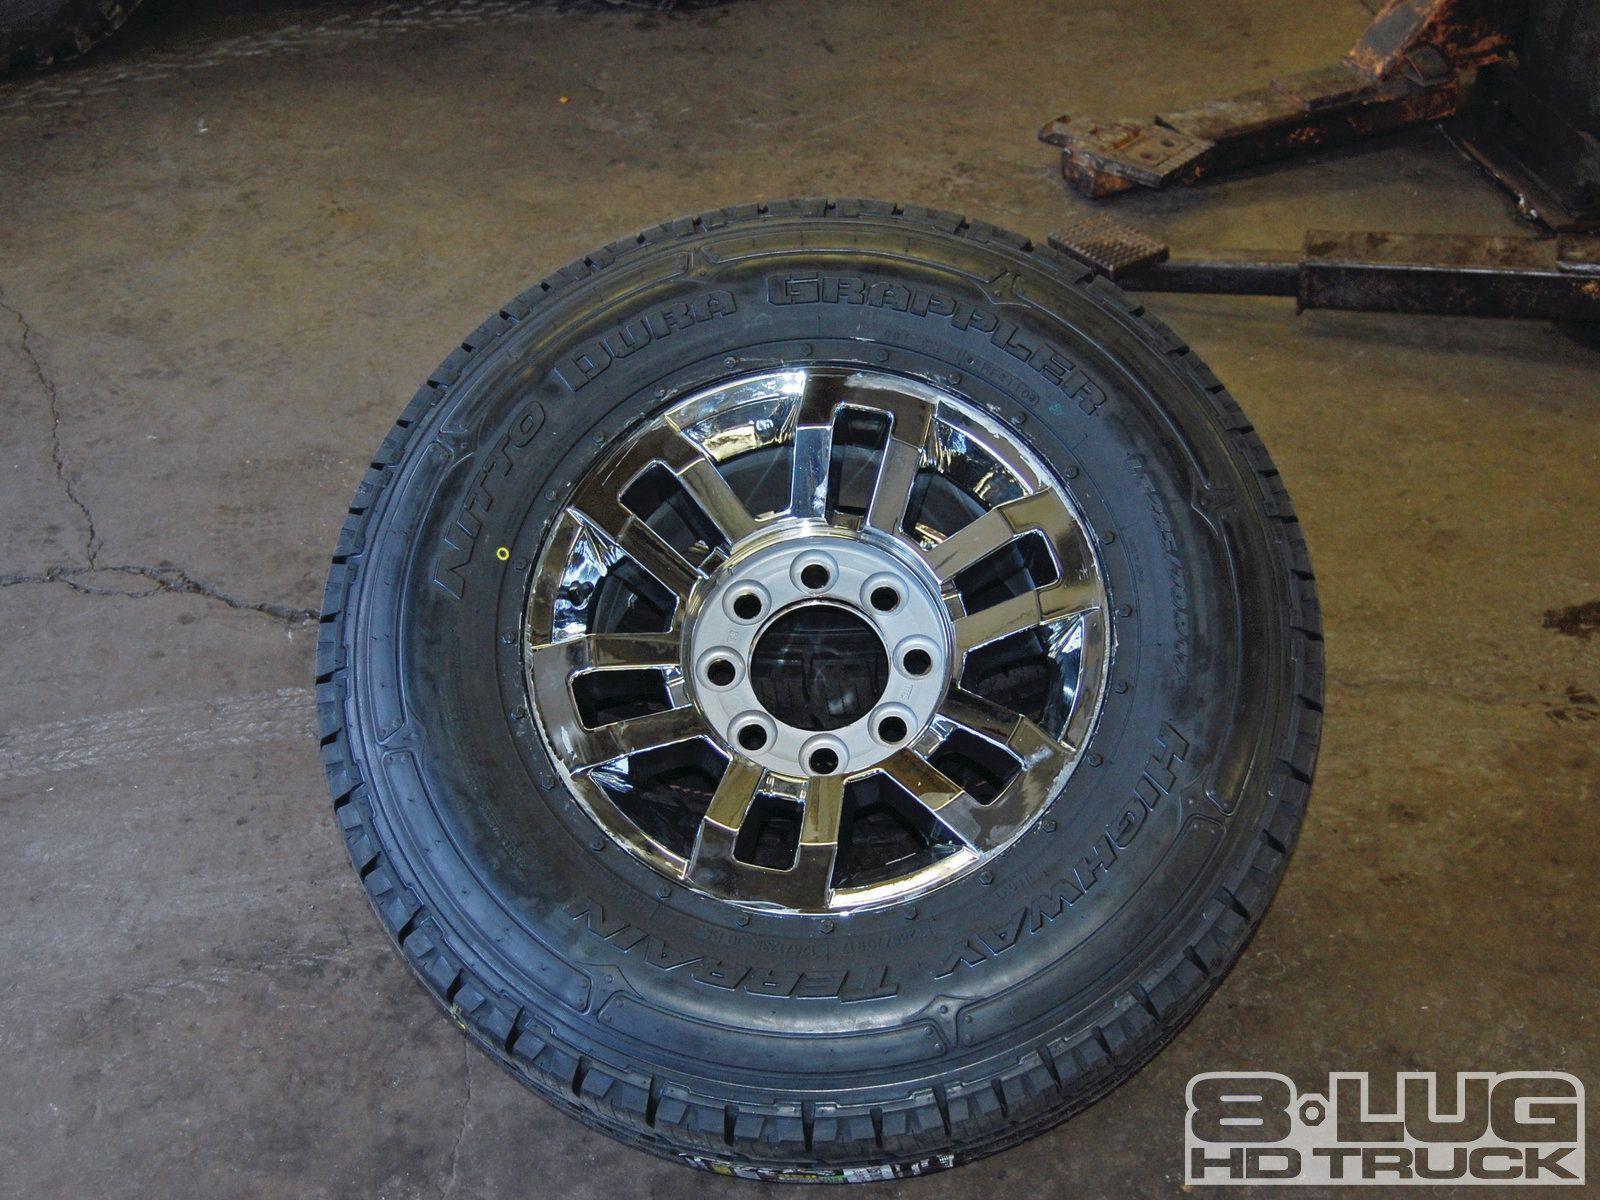 Hummer Wheels For 2500hd Duramax Duramax Truck Wheels Wheel